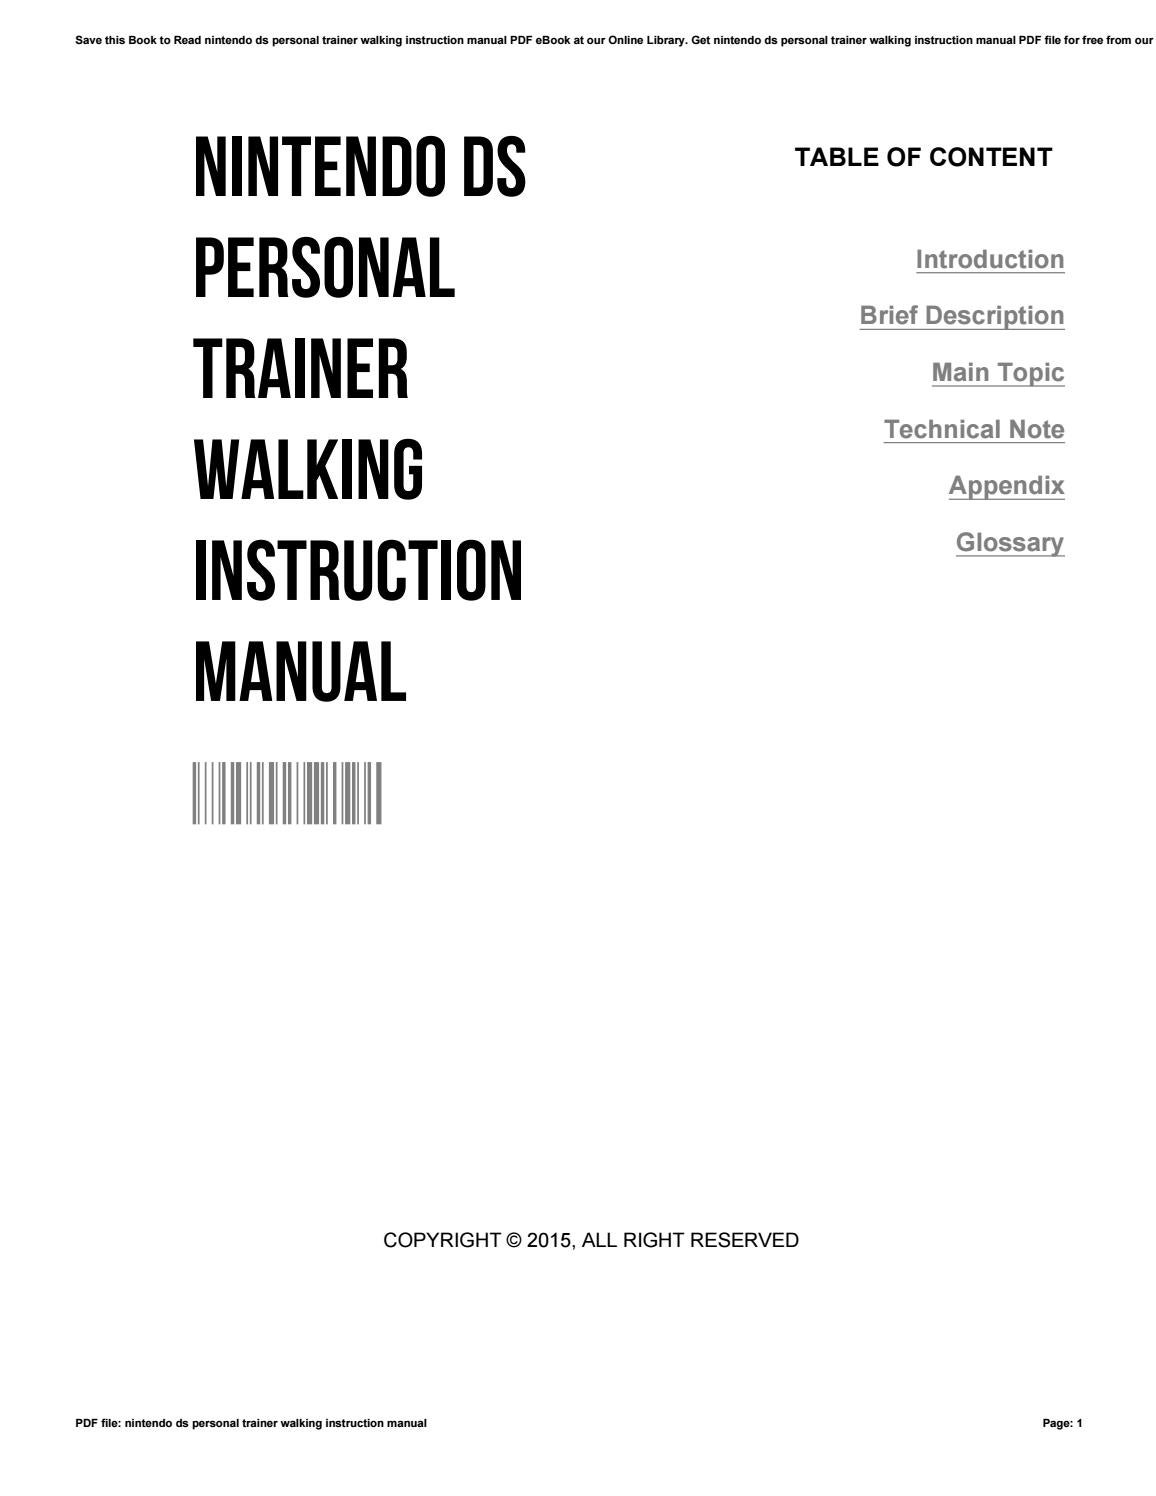 Nintendo Ds Operations Manual Pdf / Nintendo 2ds Manuals